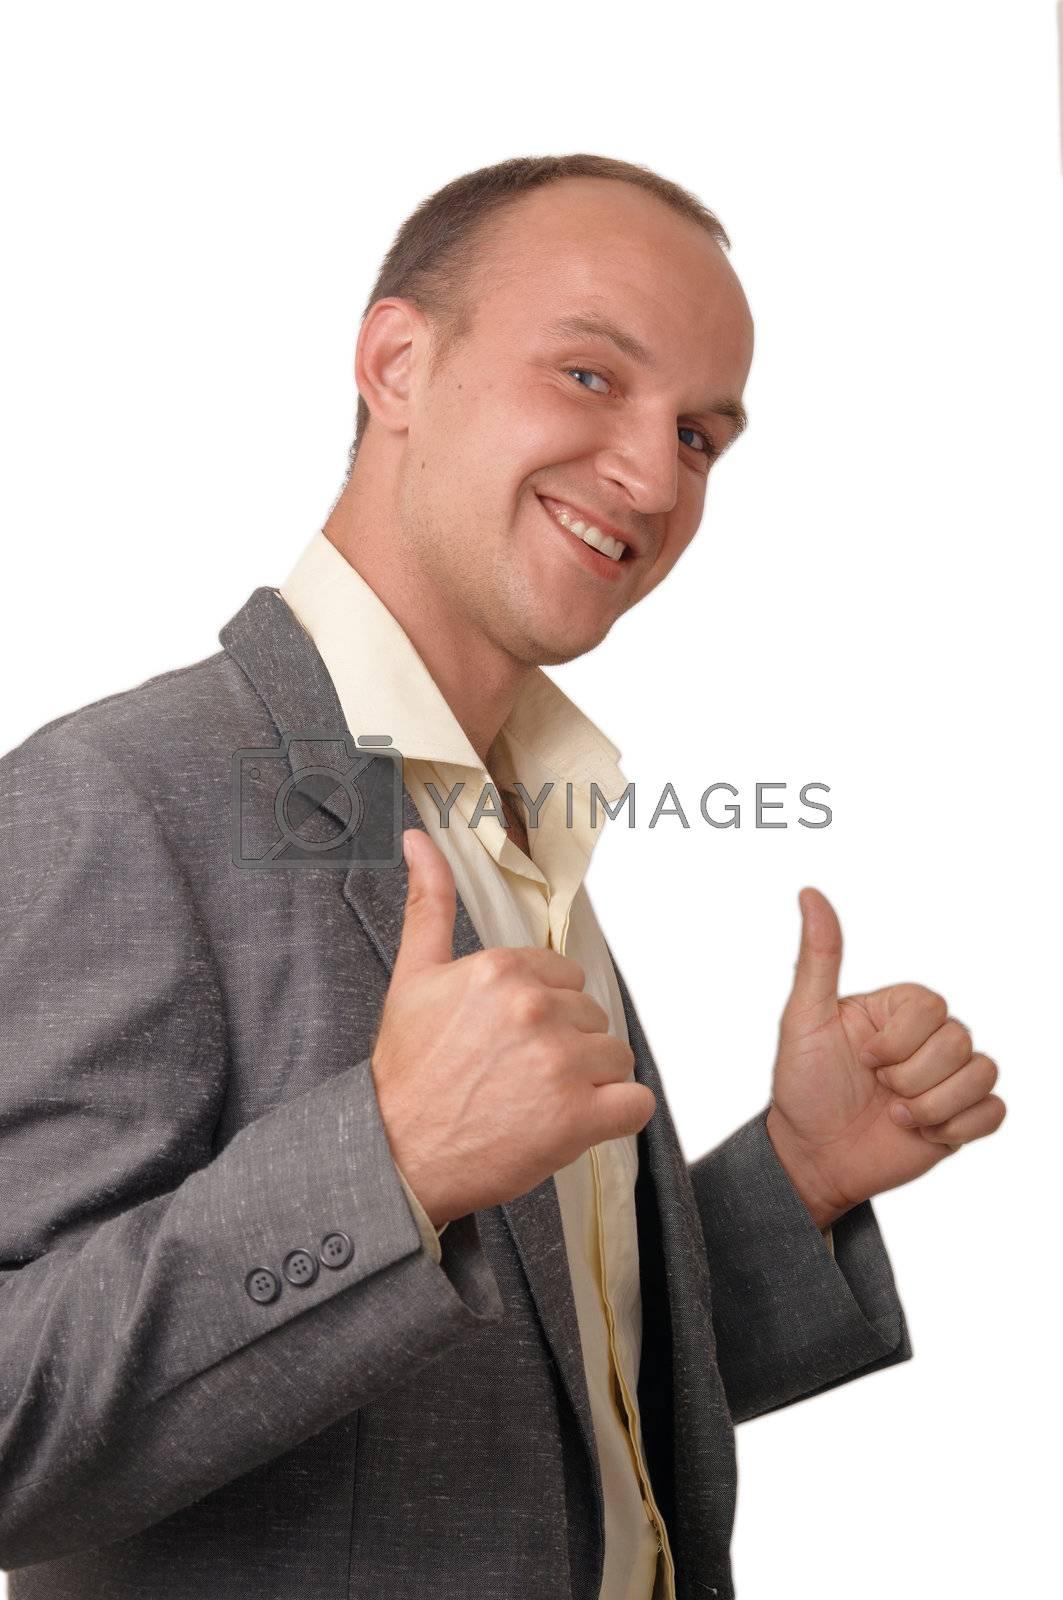 Royalty free image of A smiling  young man . by karasikvitaliy